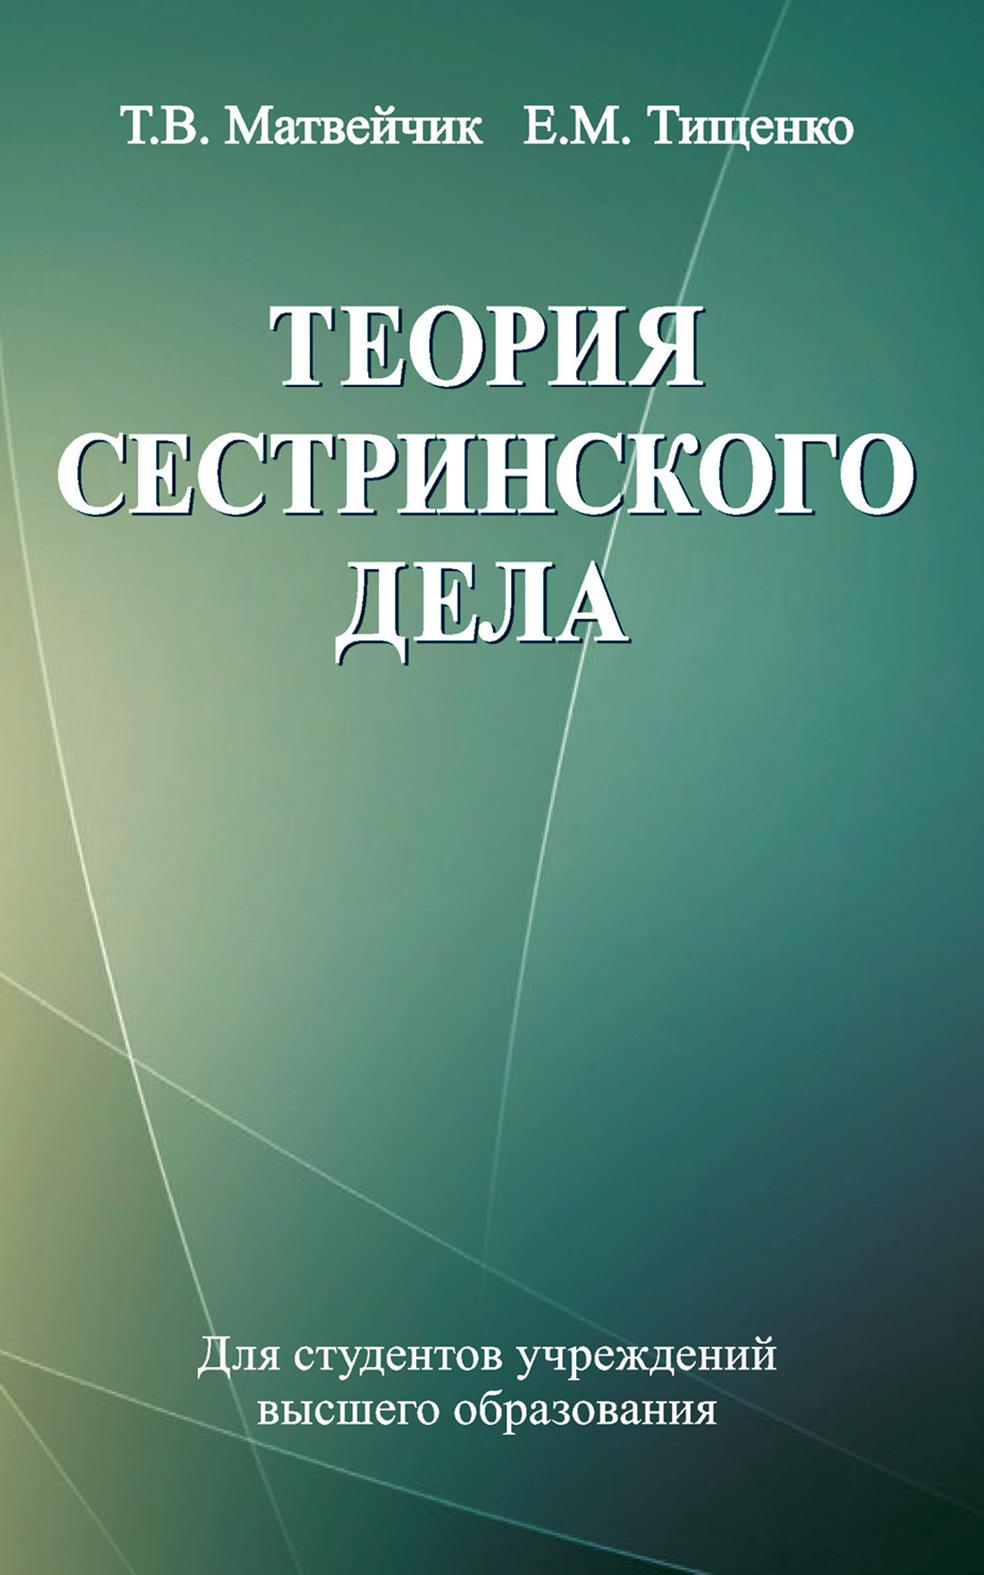 Е. М. Тищенко Теория сестринского дела